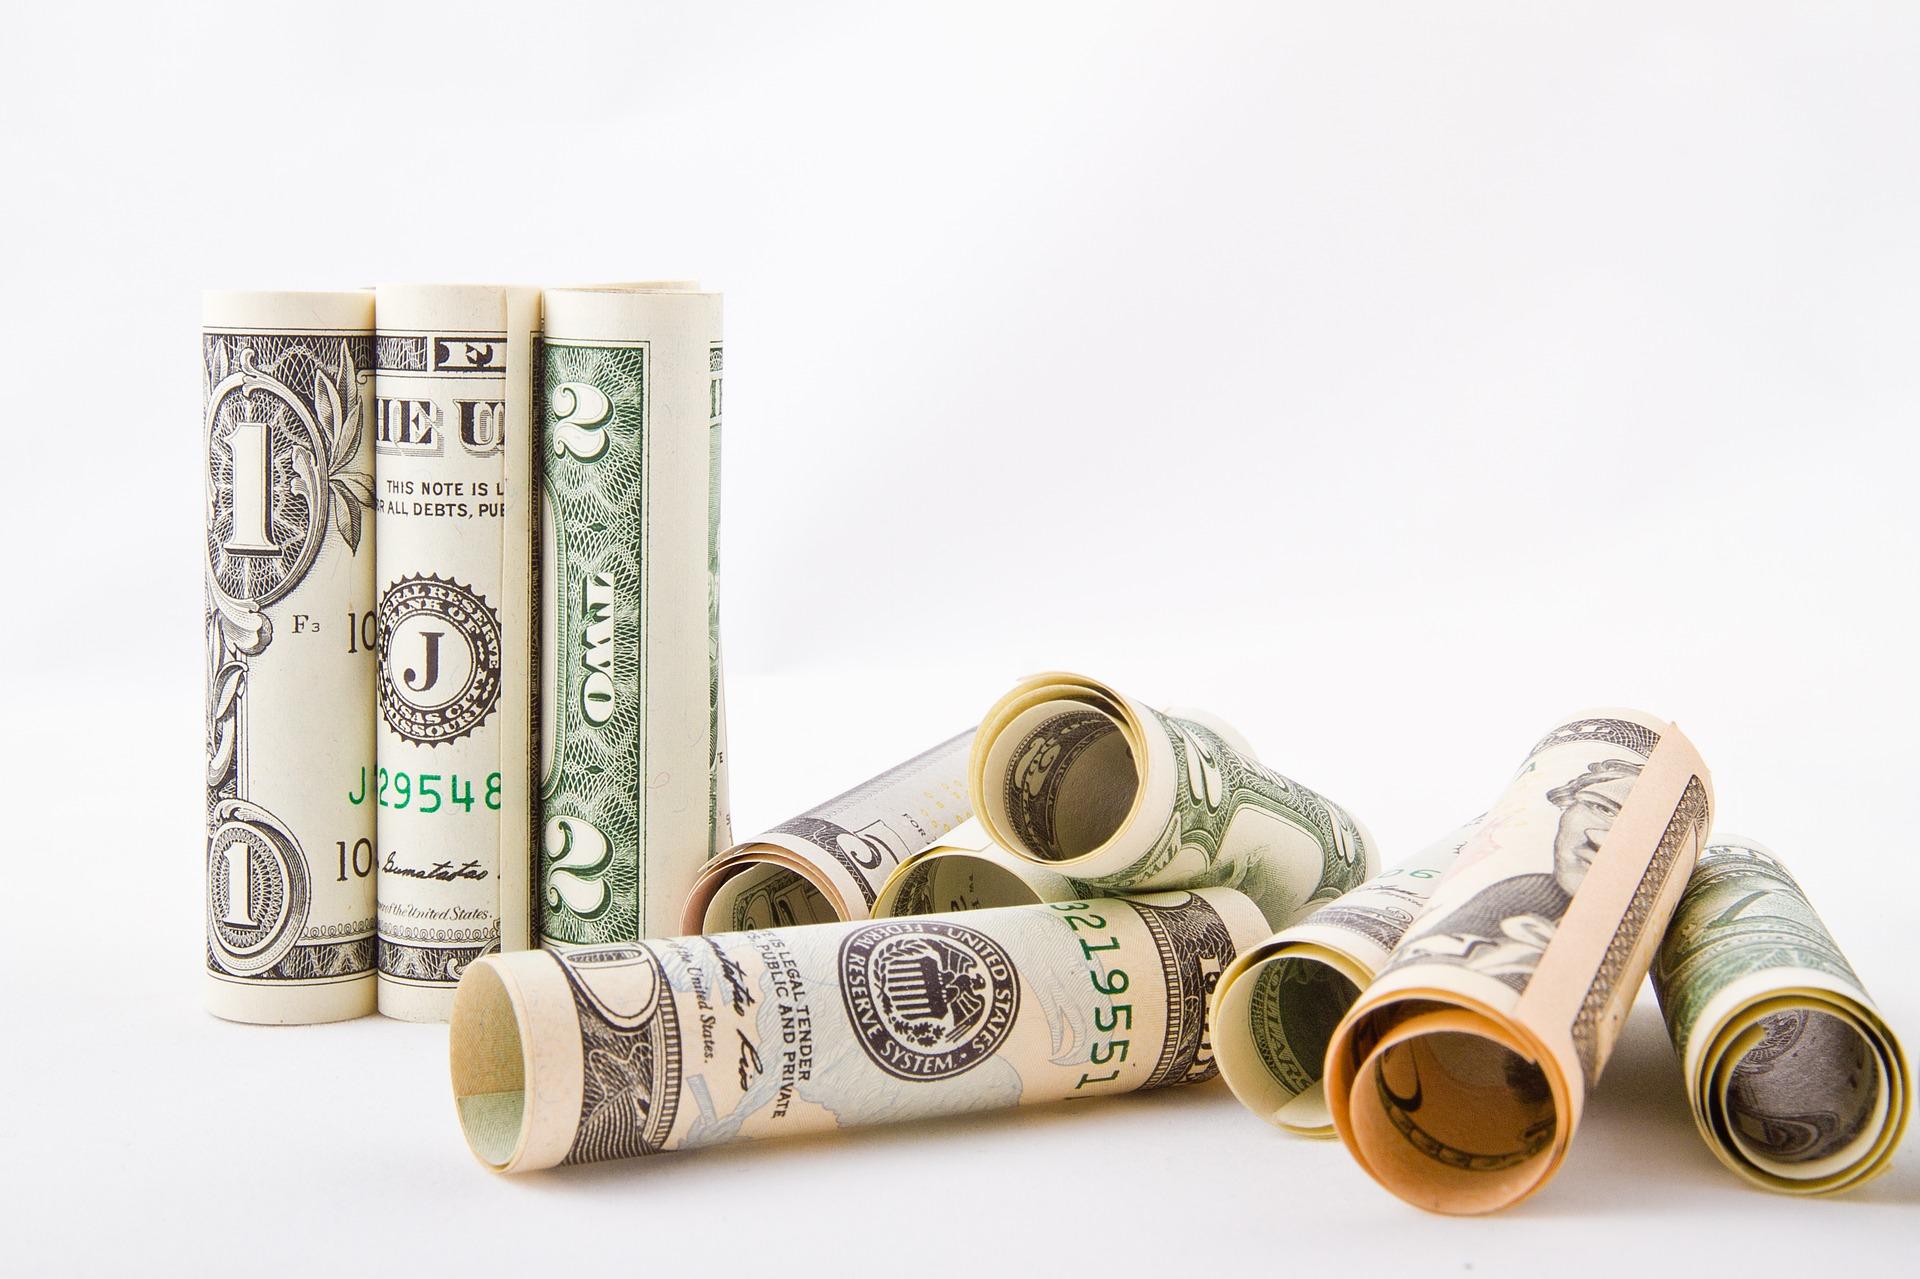 paying mlm distributors through compensation plans